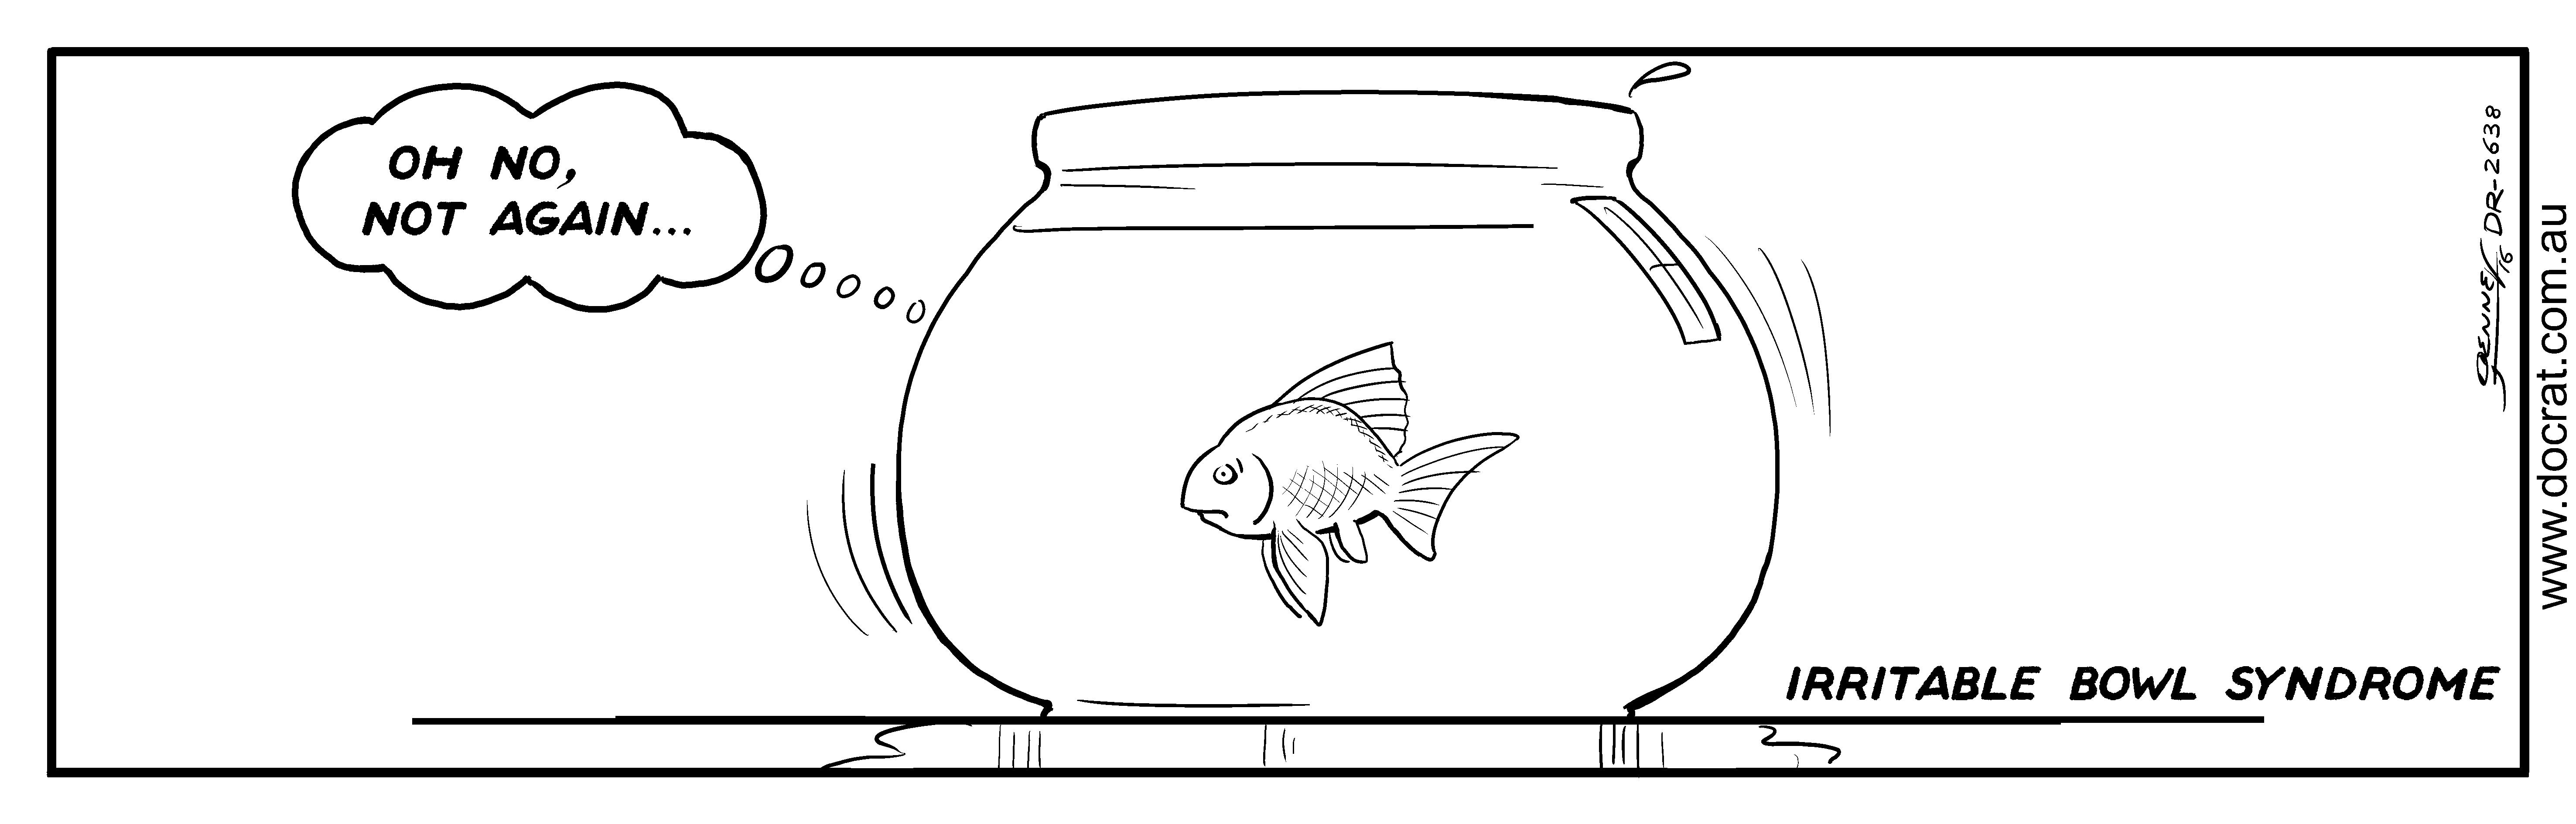 20161019